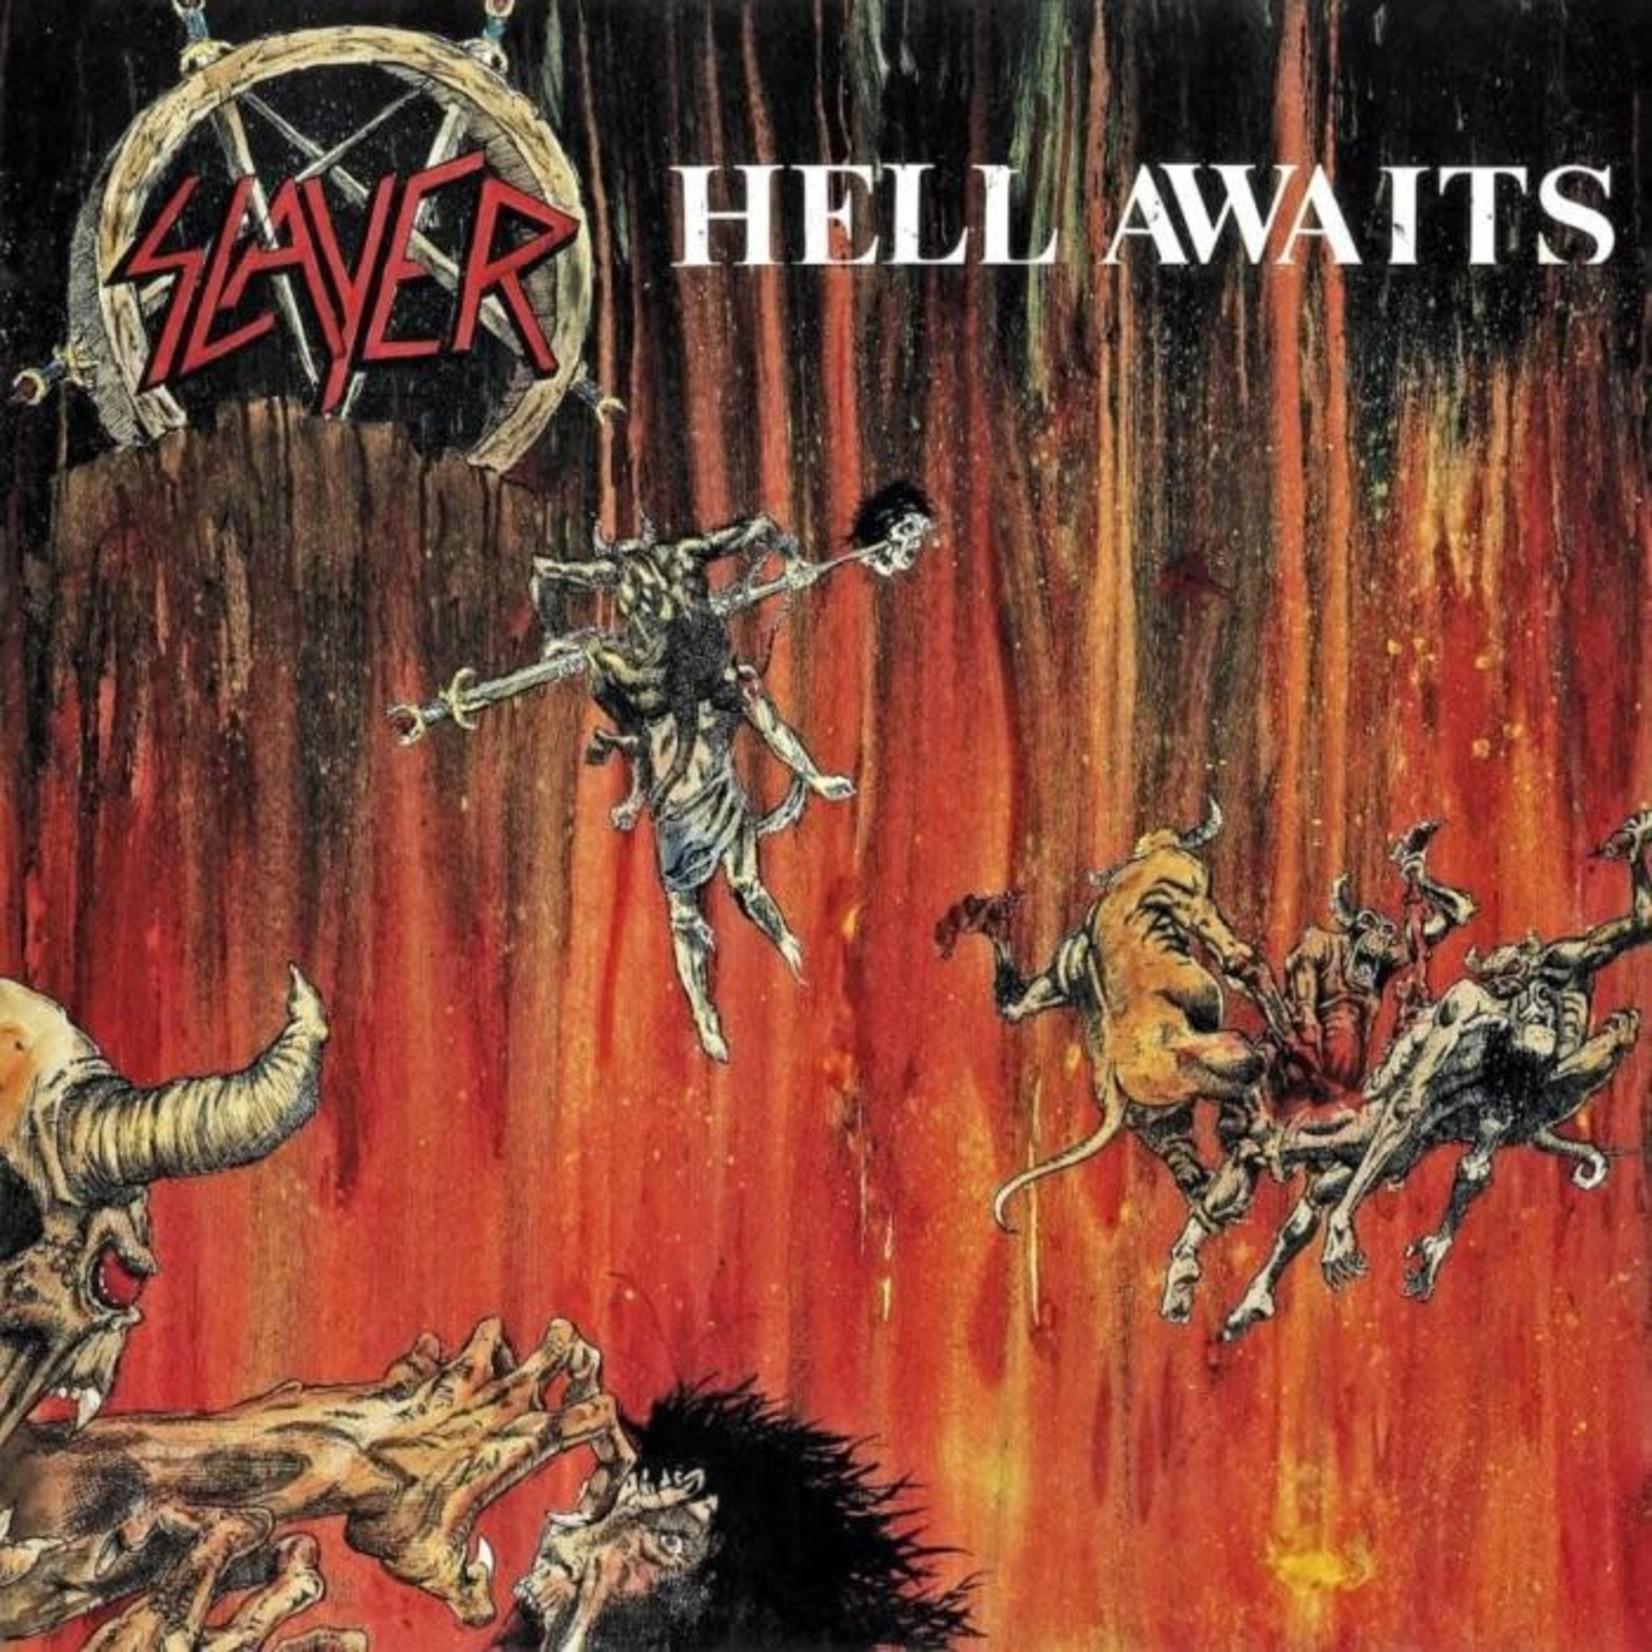 [New] Slayer: Hell Awaits